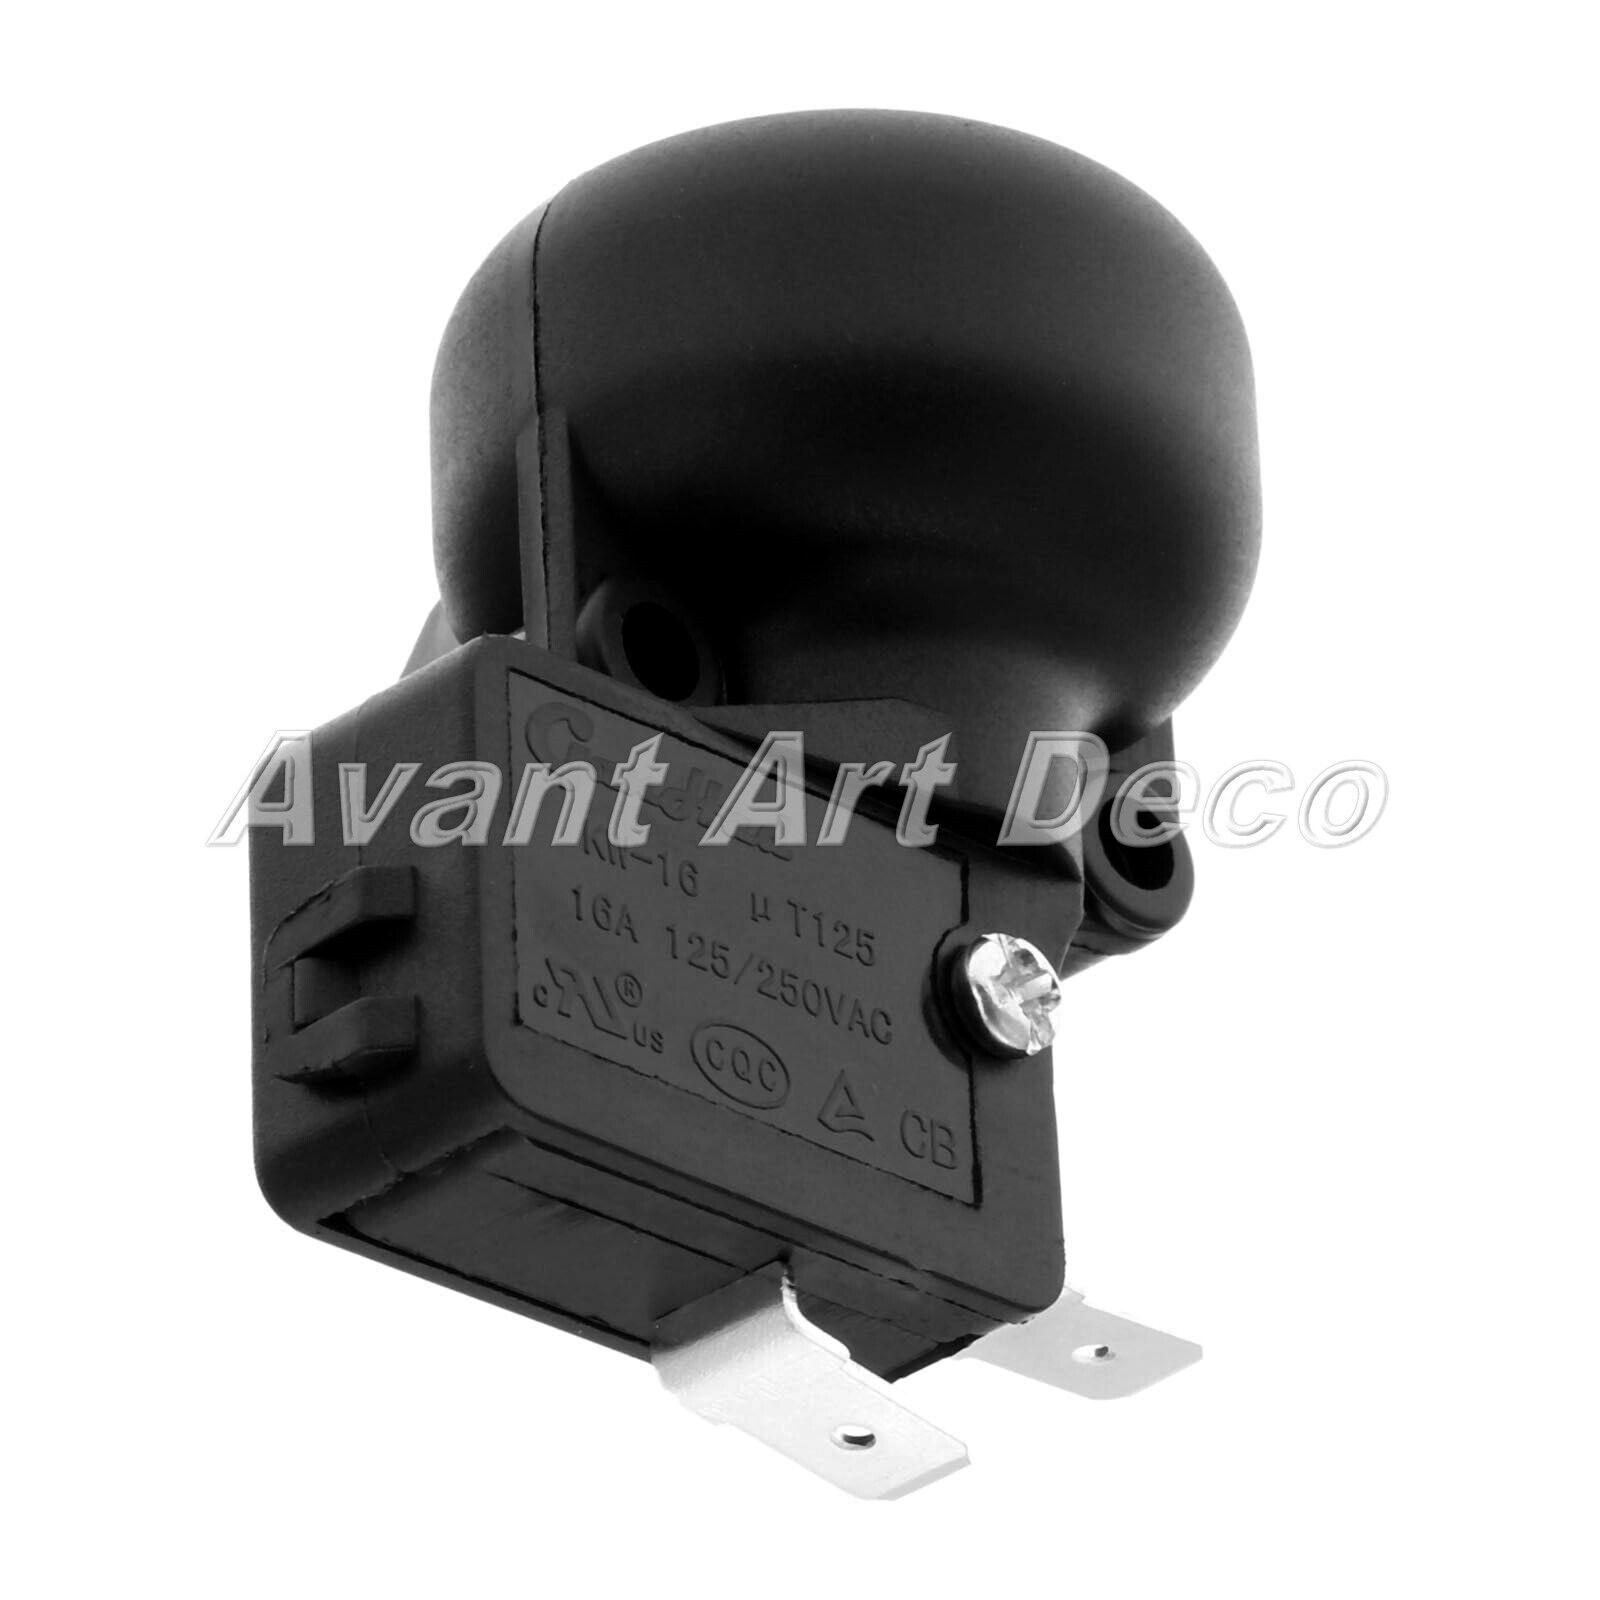 Anti-dump Anti Tilt Swith Safety Patio Heater Heater Accessory Parts Universal